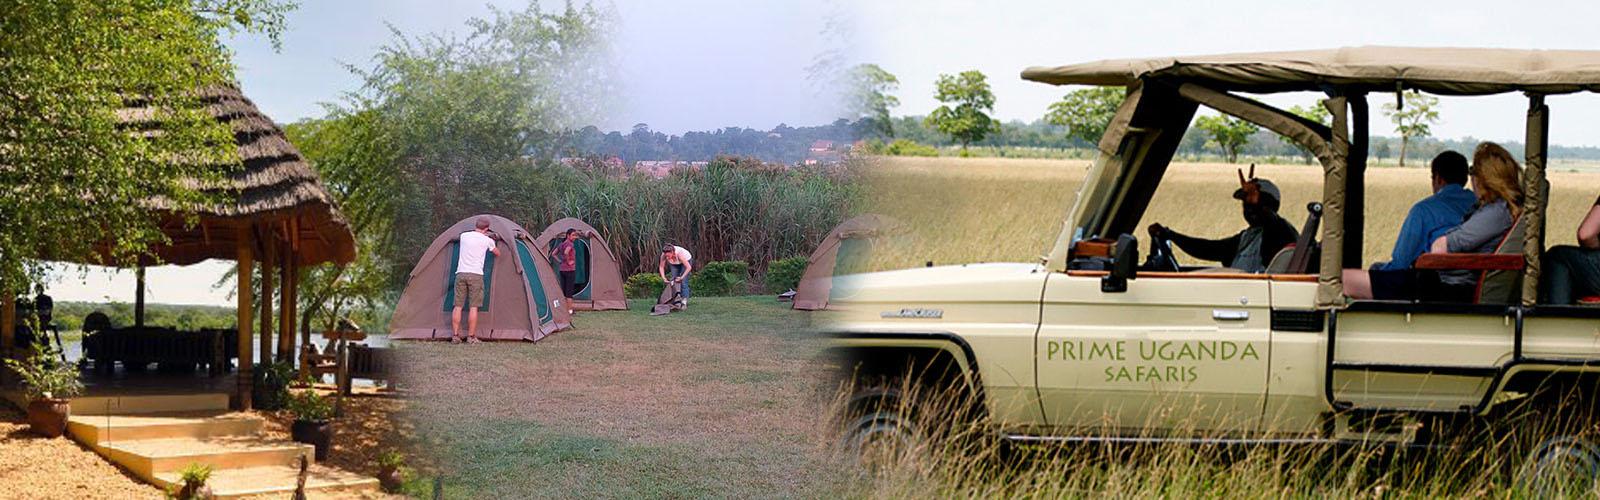 Uganda camping safari